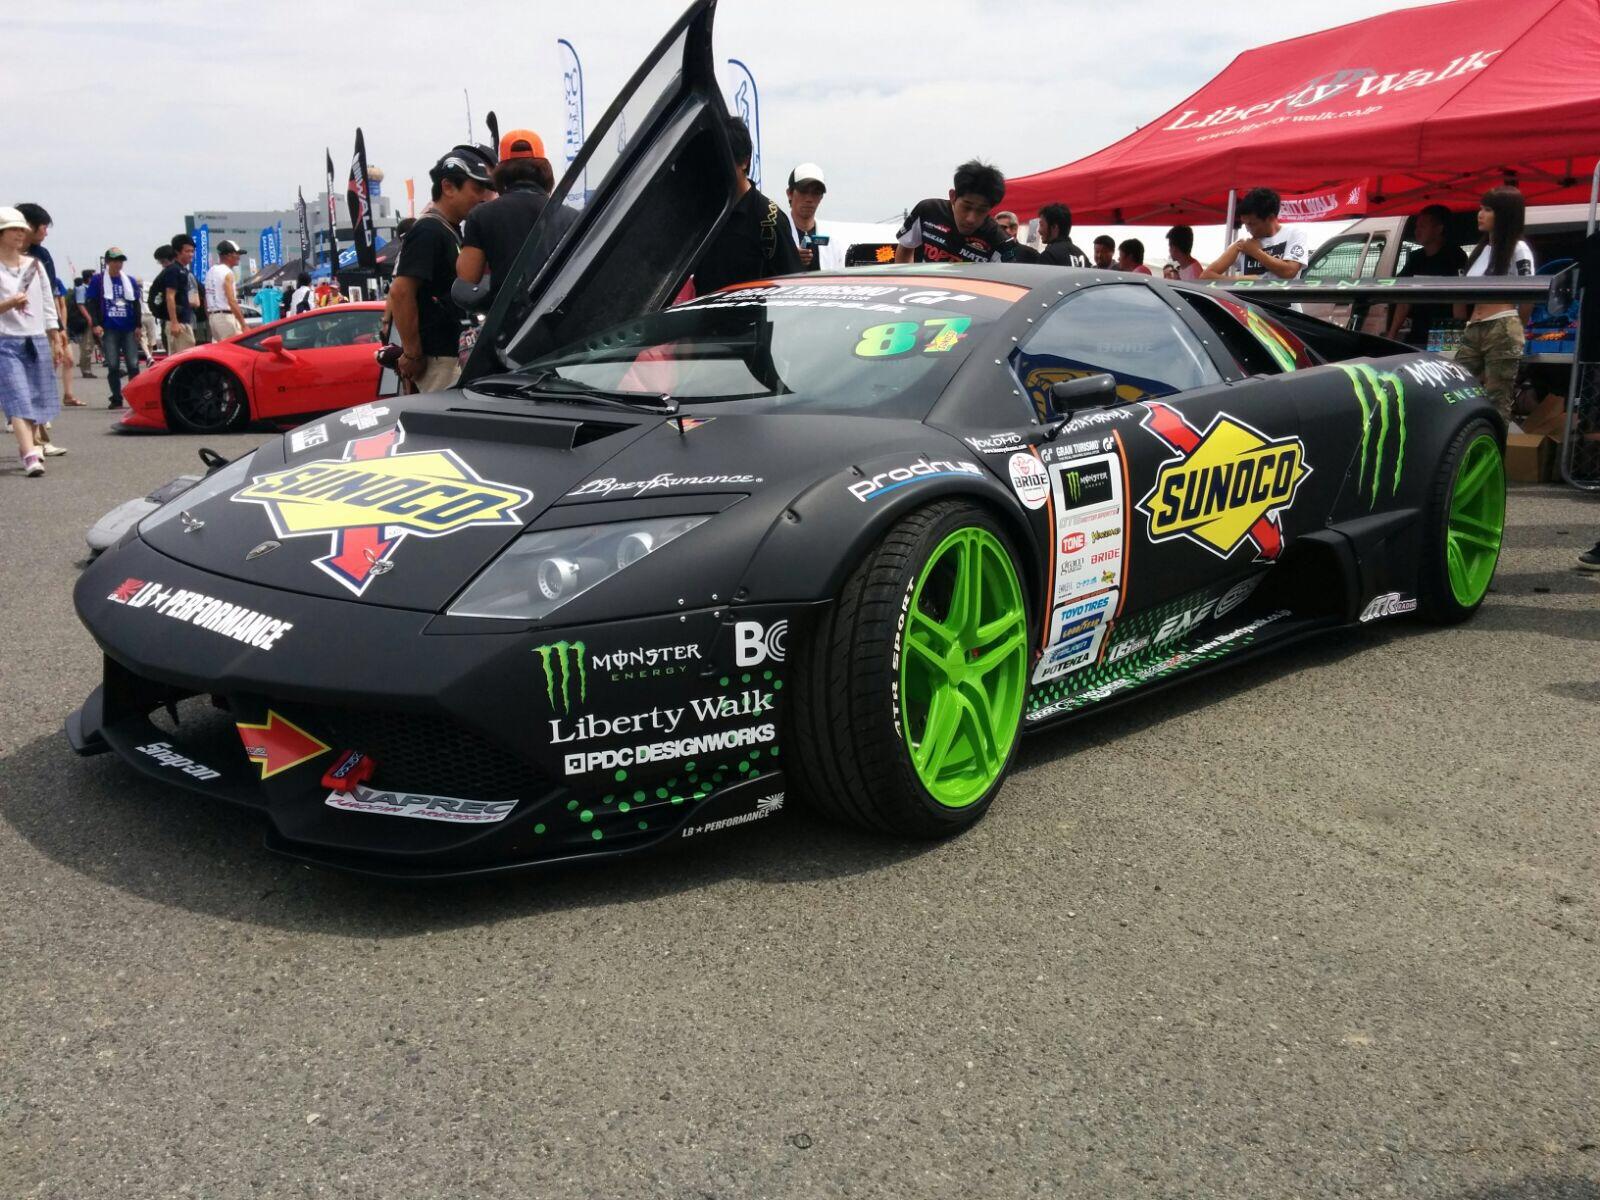 Daigo Saito Lamborghini Murcielago Drift Car